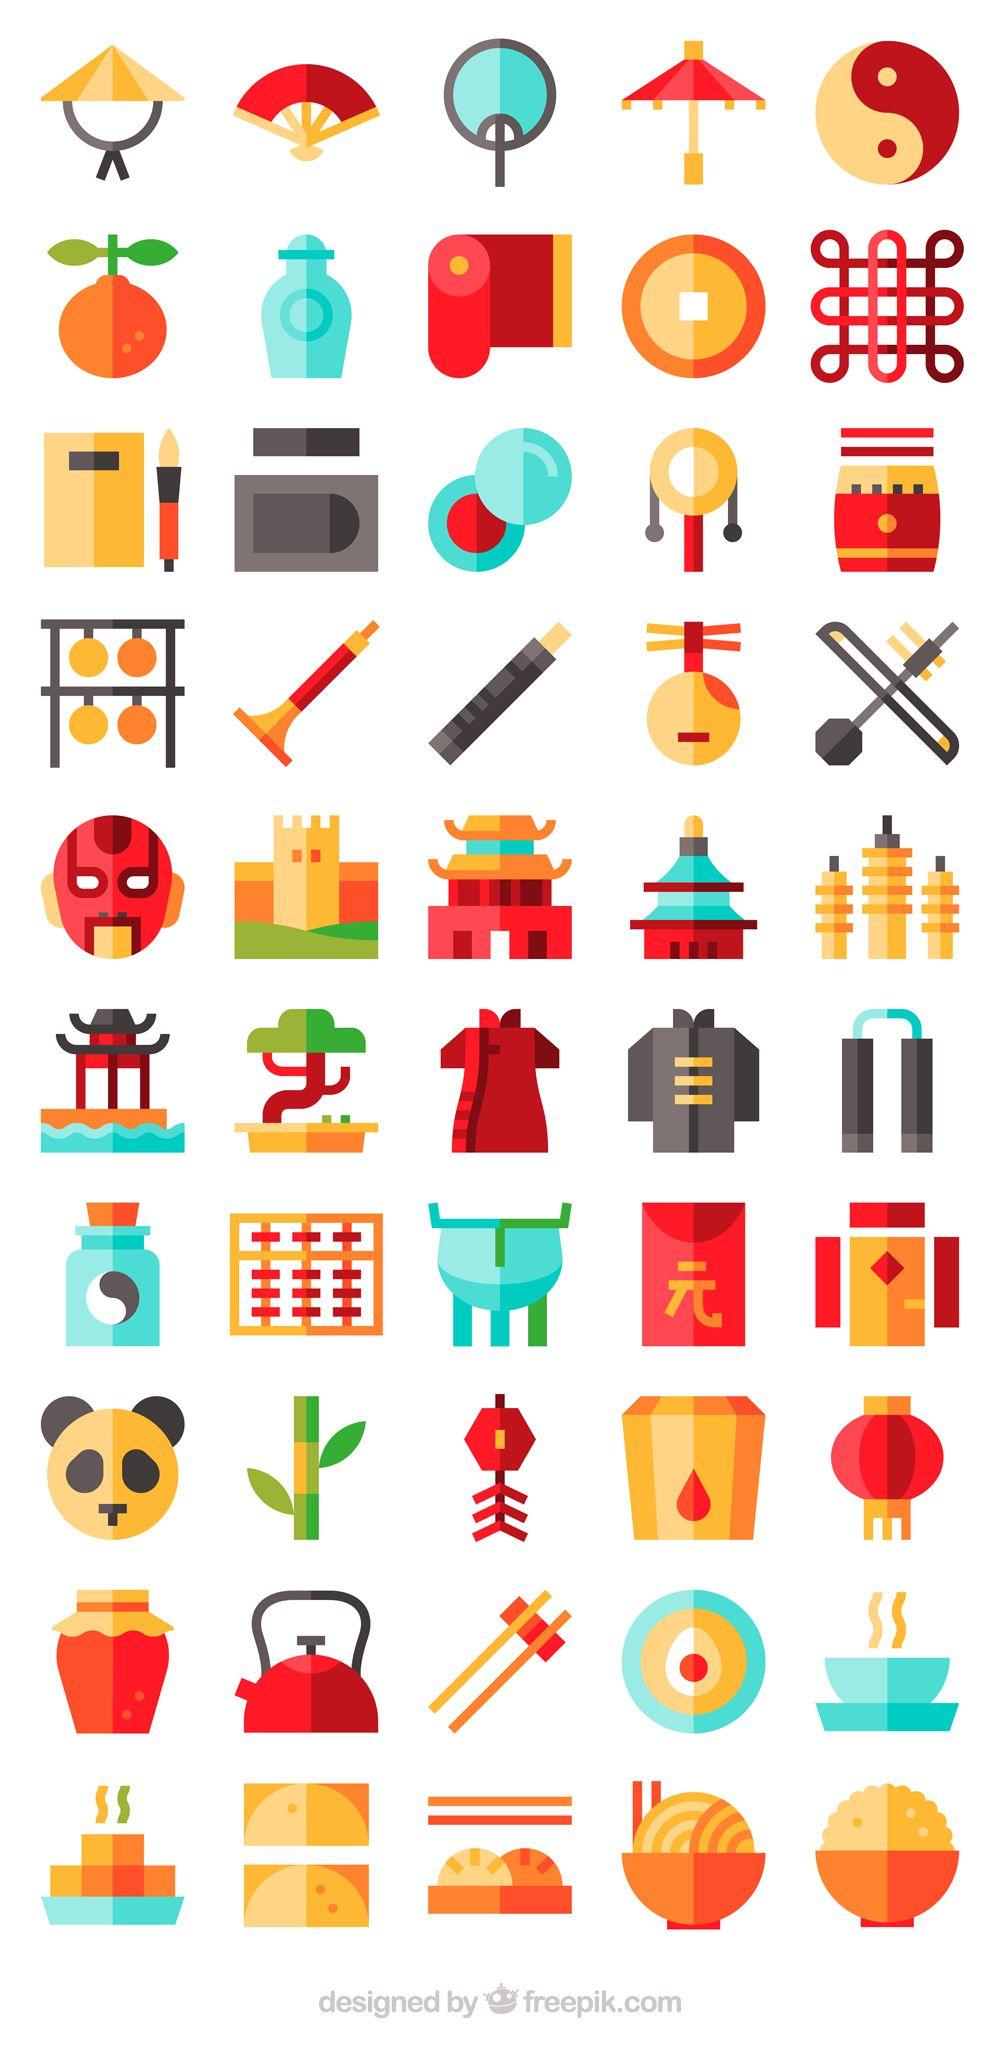 50 free vector icons of China designed by Freepik China